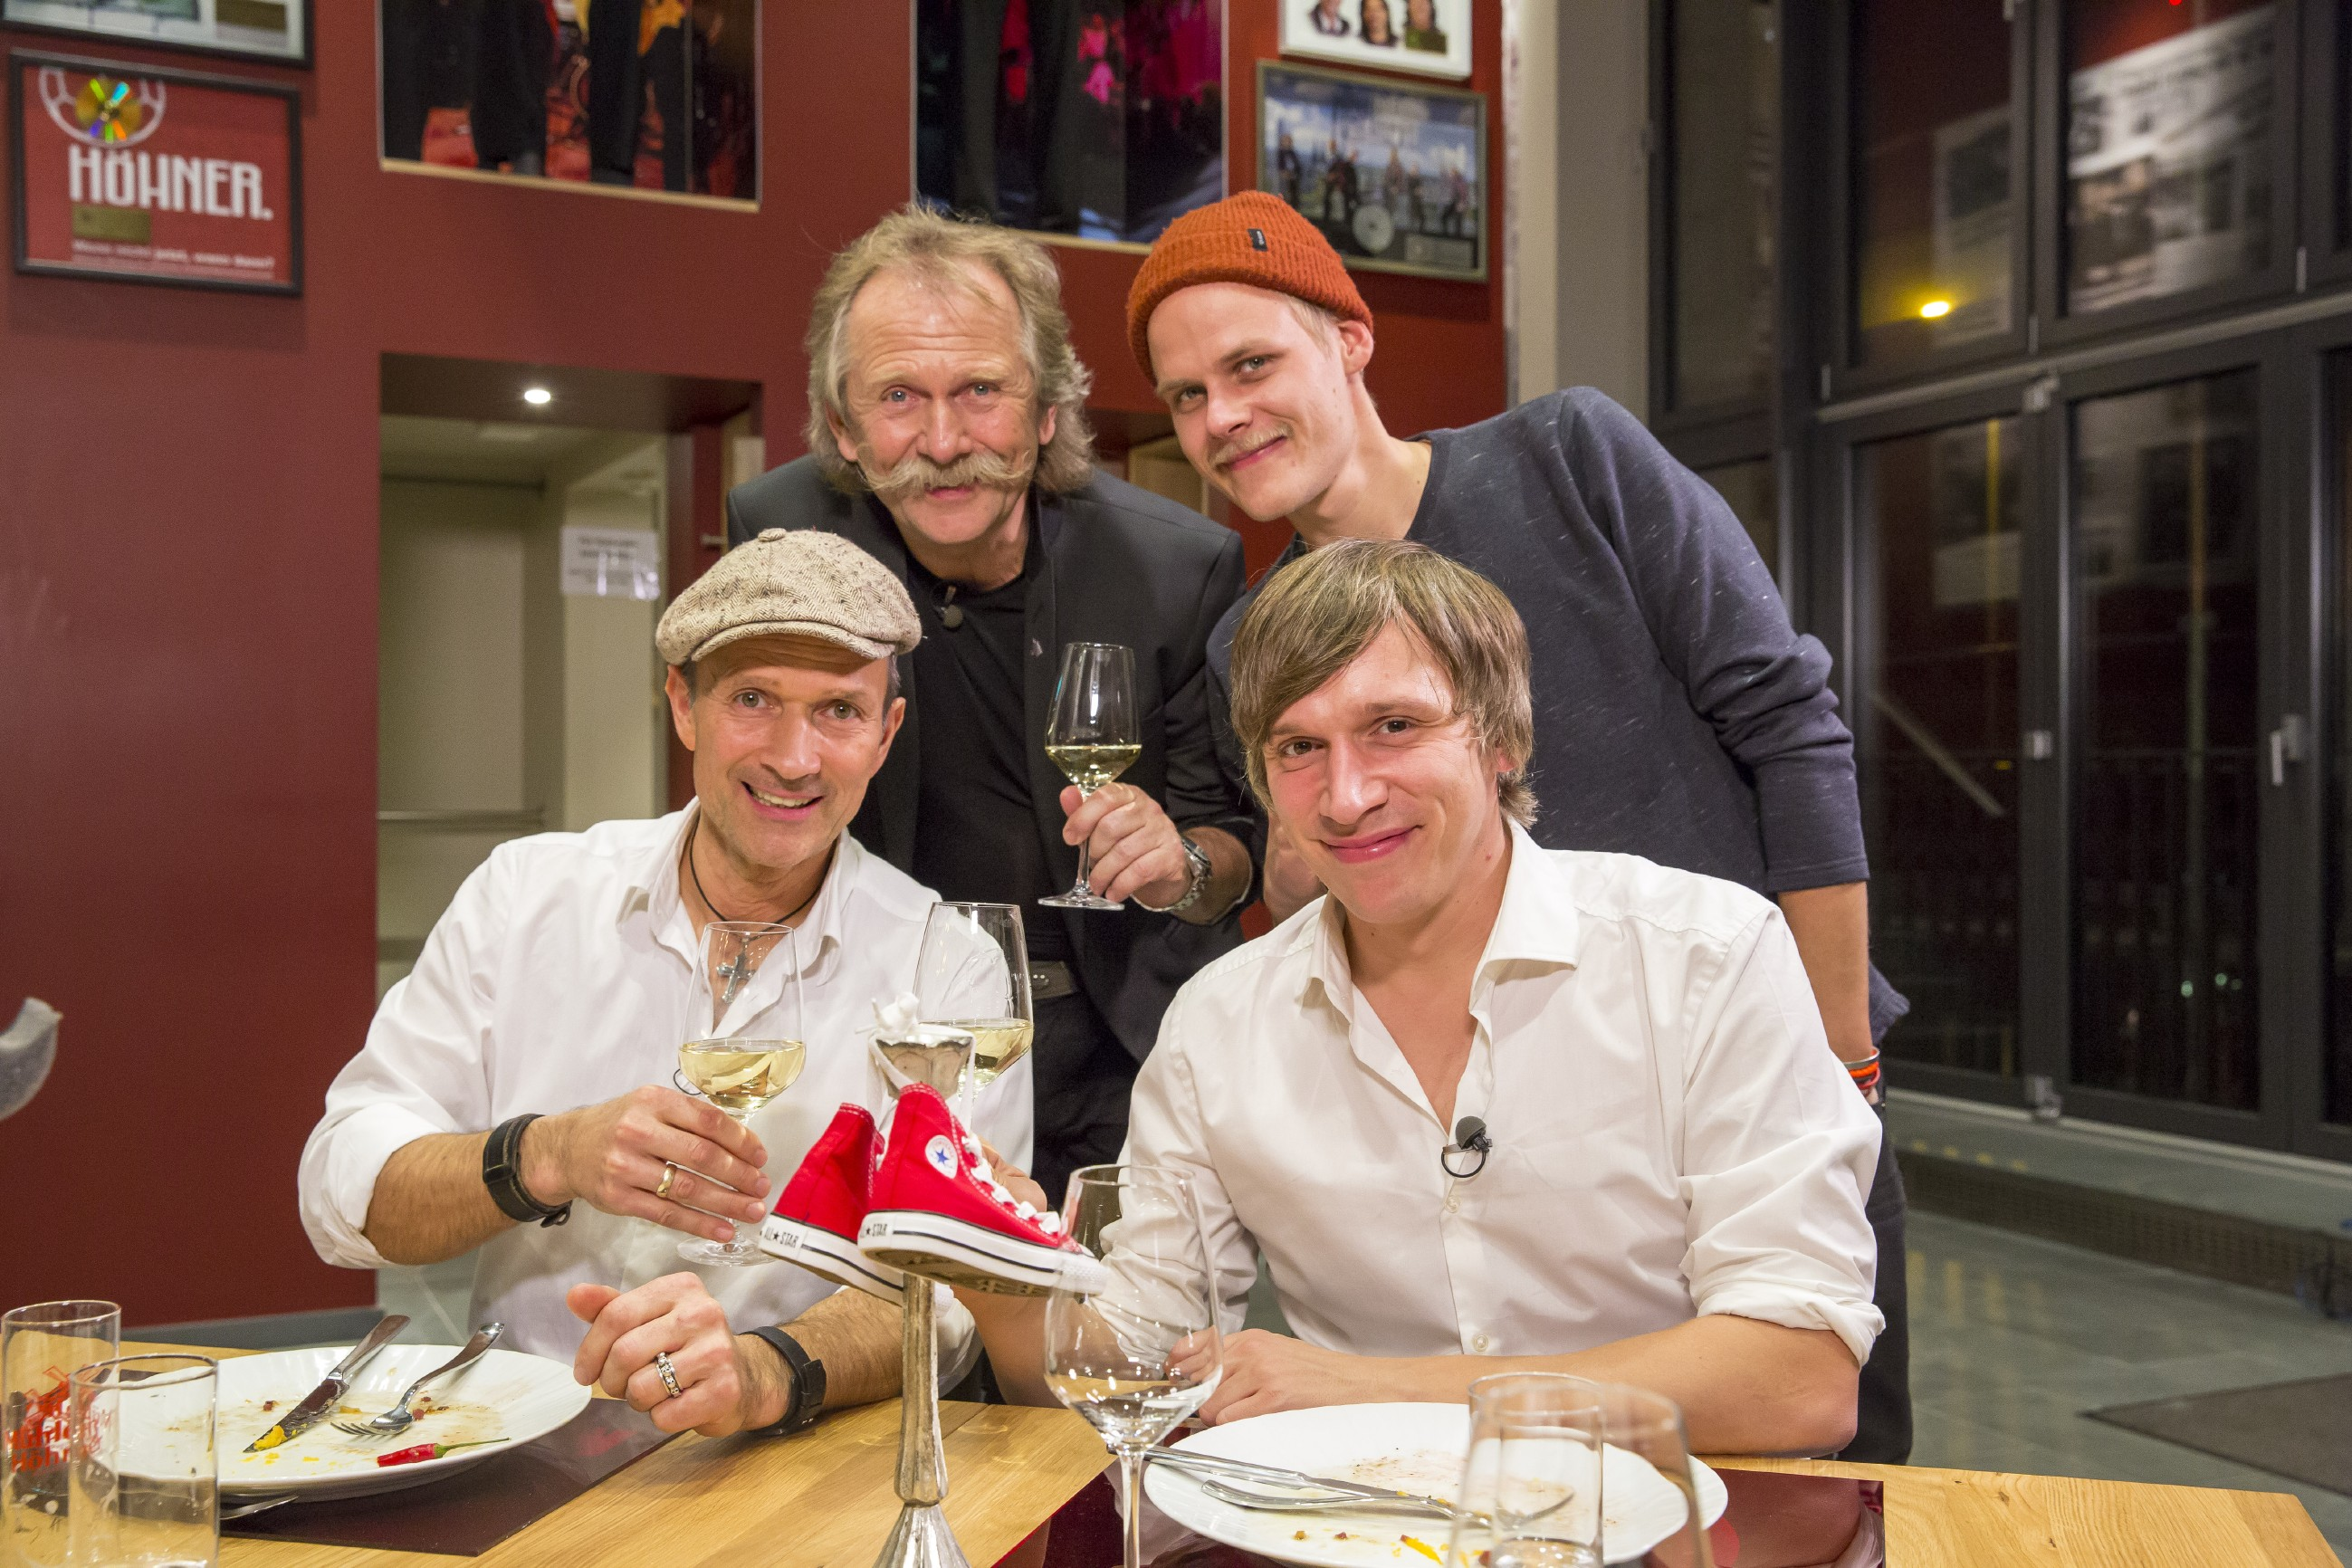 Promi Dinner - Frank Reudenbach, Henning Krautmacher, Oliver Niesen und Bastian Campmann